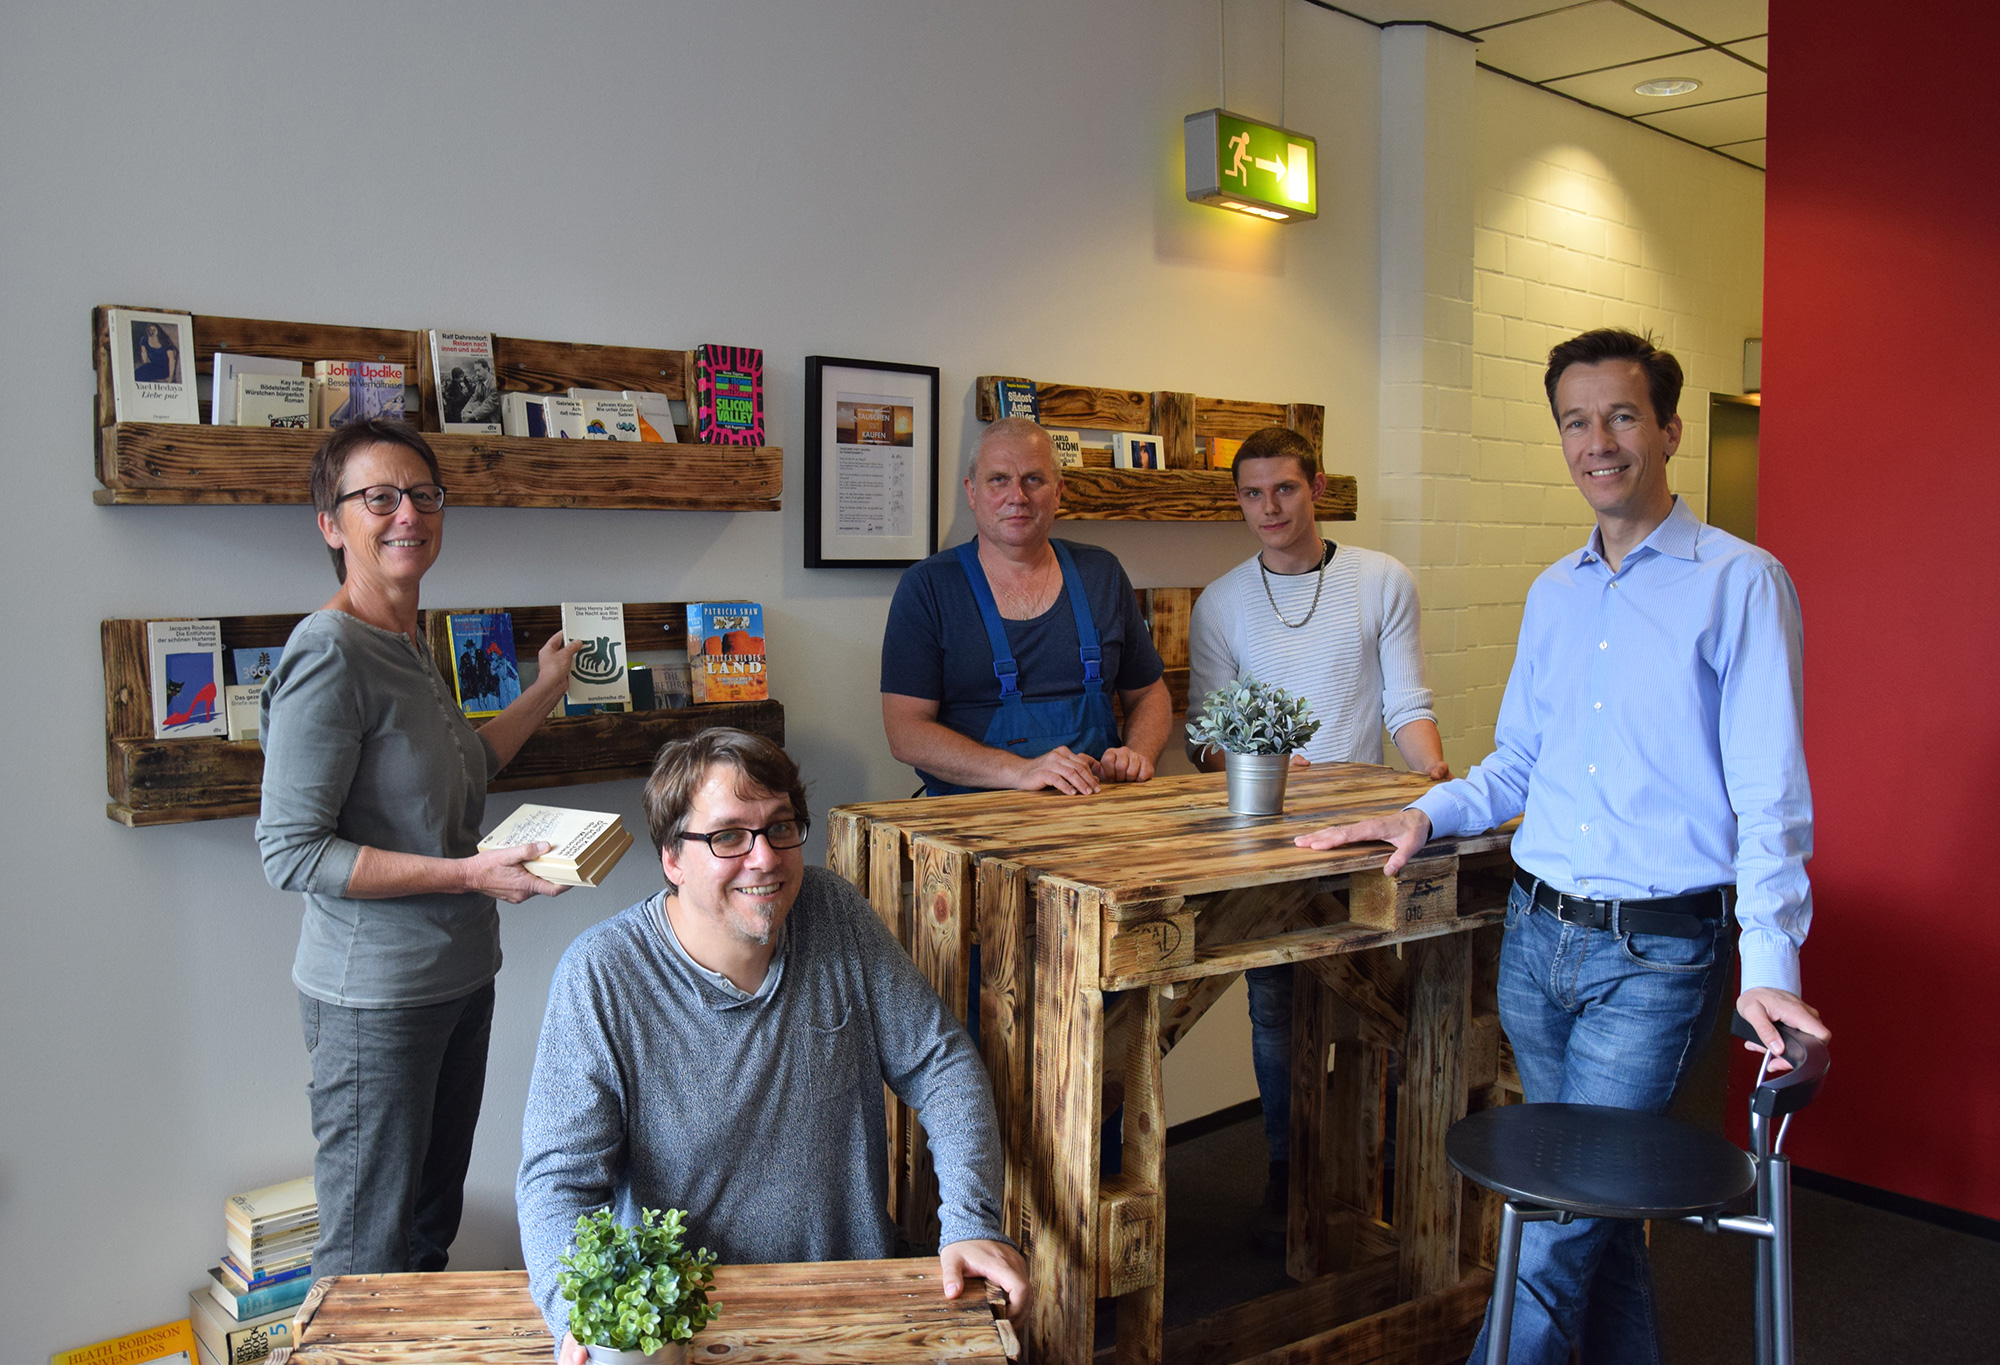 studentenwerk oldenburg neue m bel f r das kabuff in der cafeteria uhlhornsweg. Black Bedroom Furniture Sets. Home Design Ideas